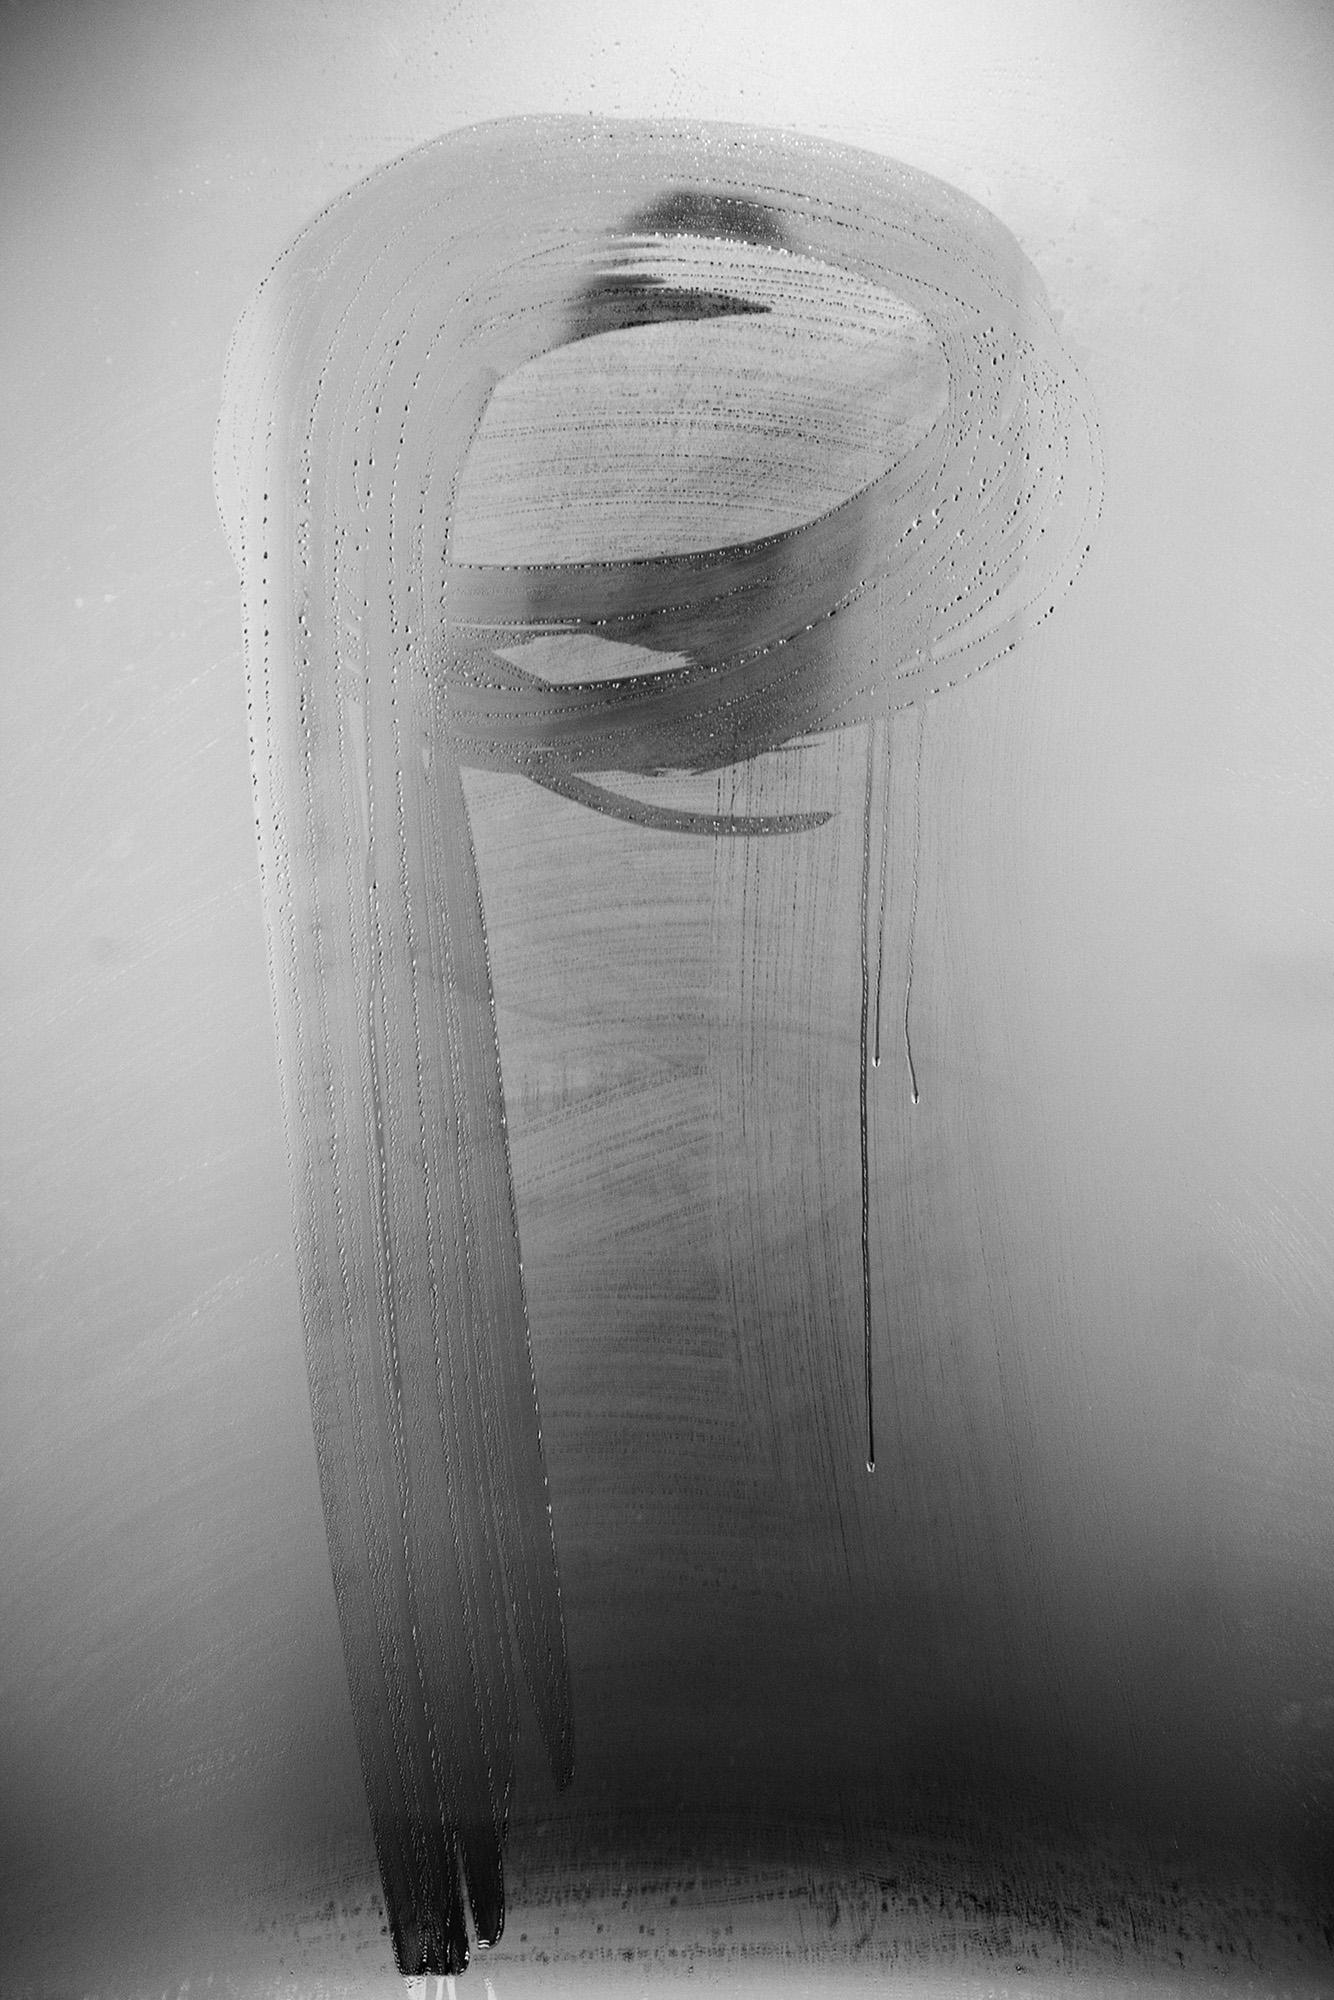 Eugenia Raskopoulos, diglossia-2009-#8-2010-Digital-pigment-print-on-archival-paper-142cm-x-95cm